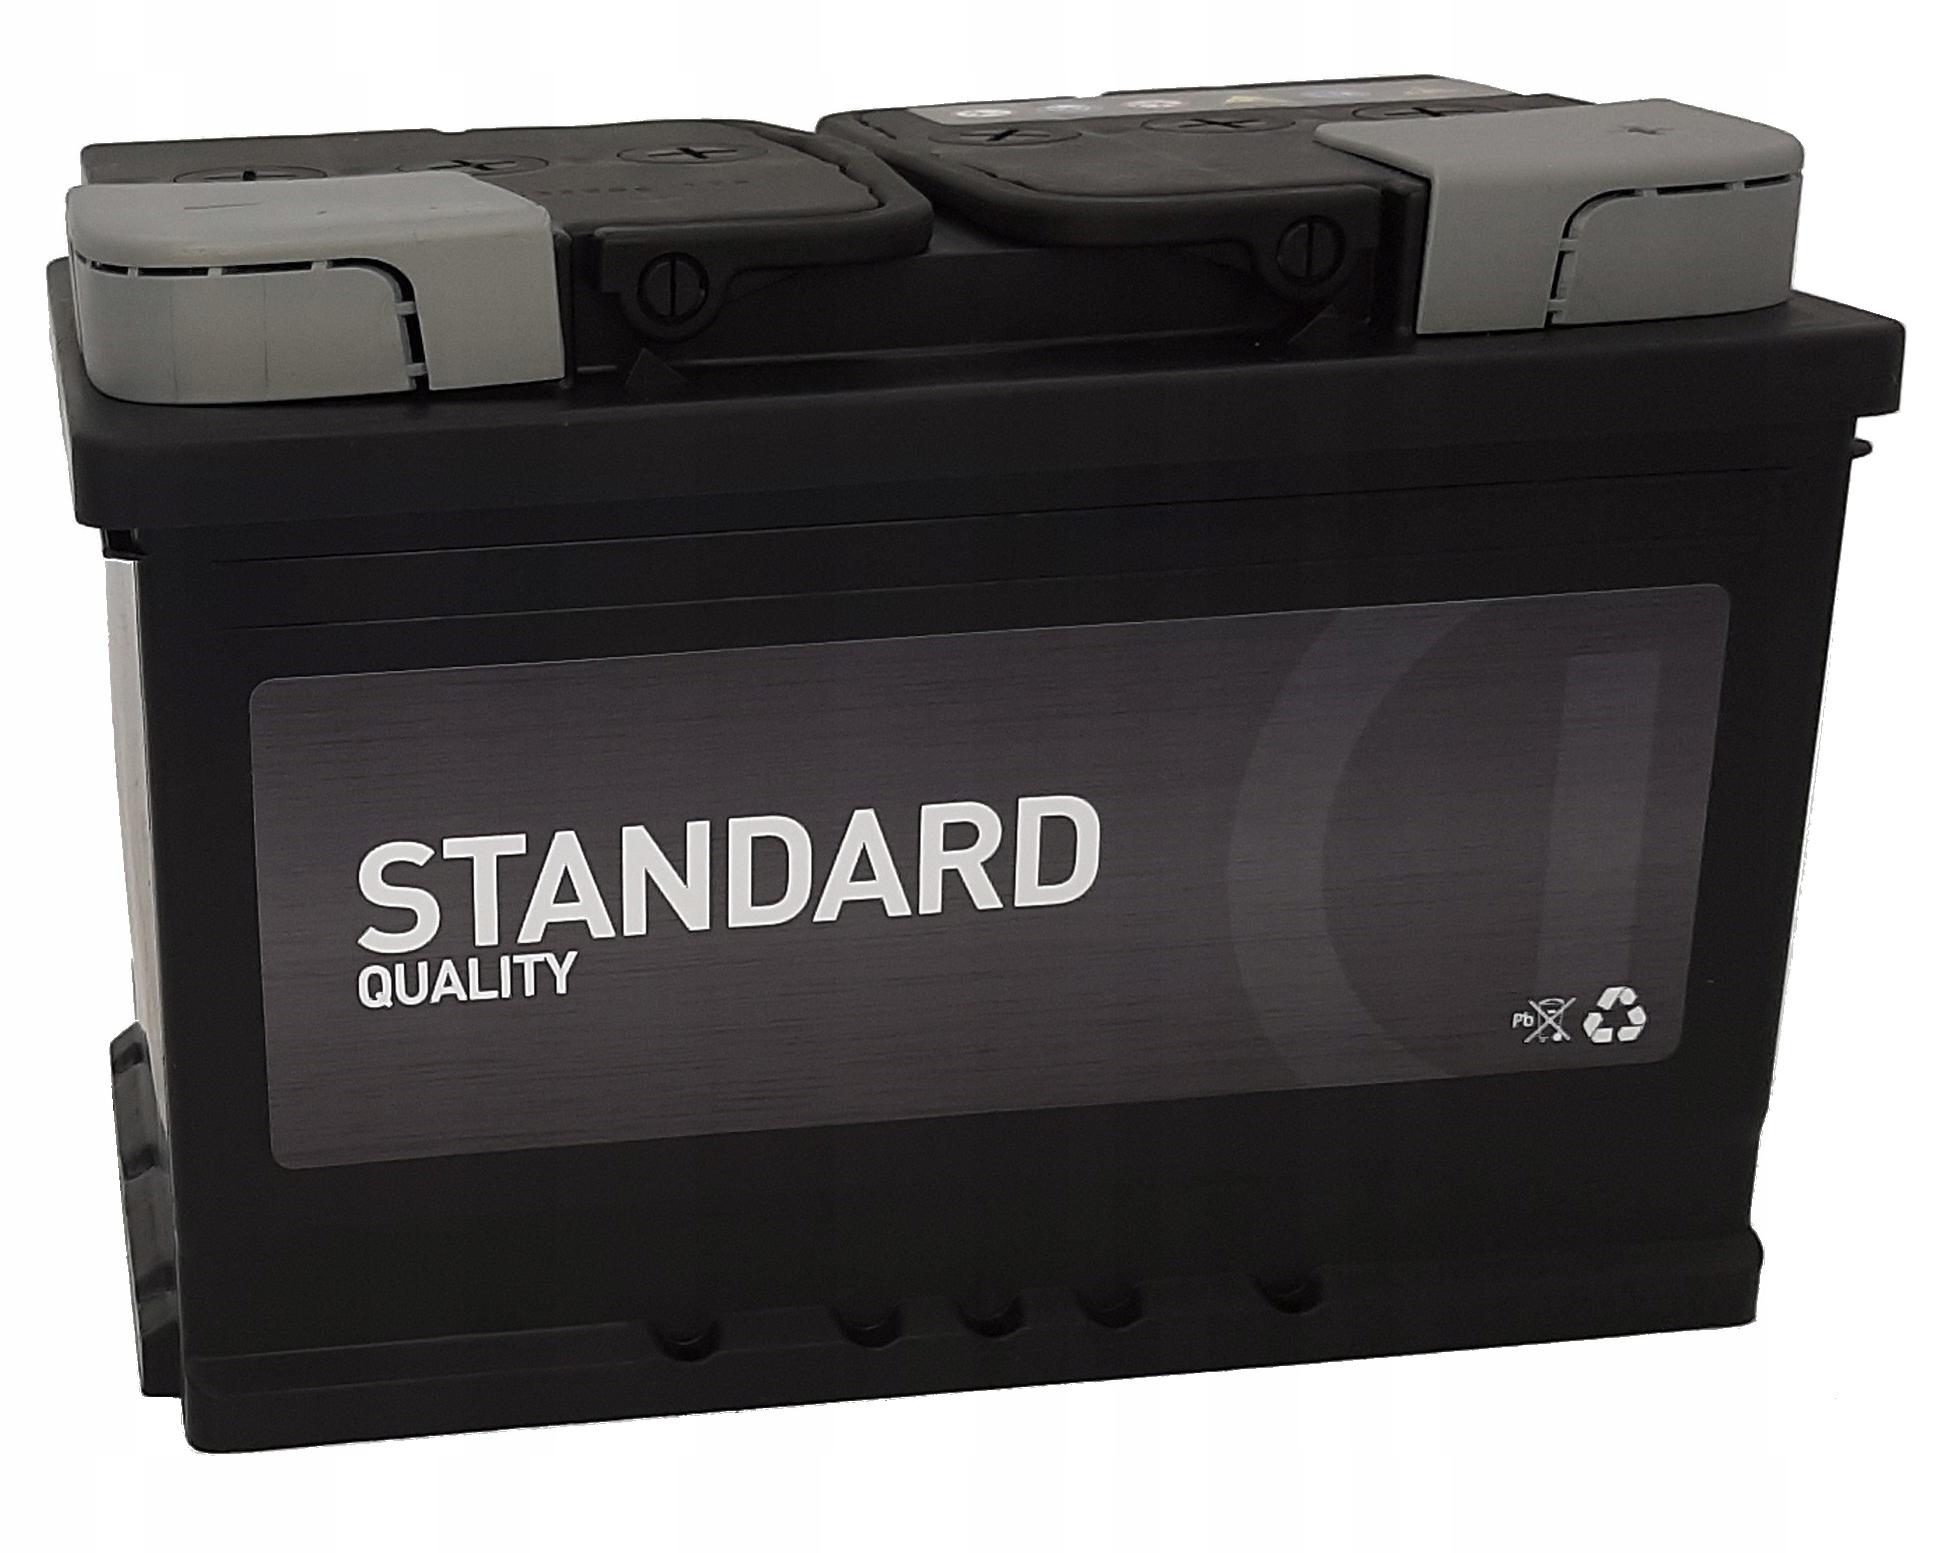 аккумулятор стандарт quality 12v 74ah 680a